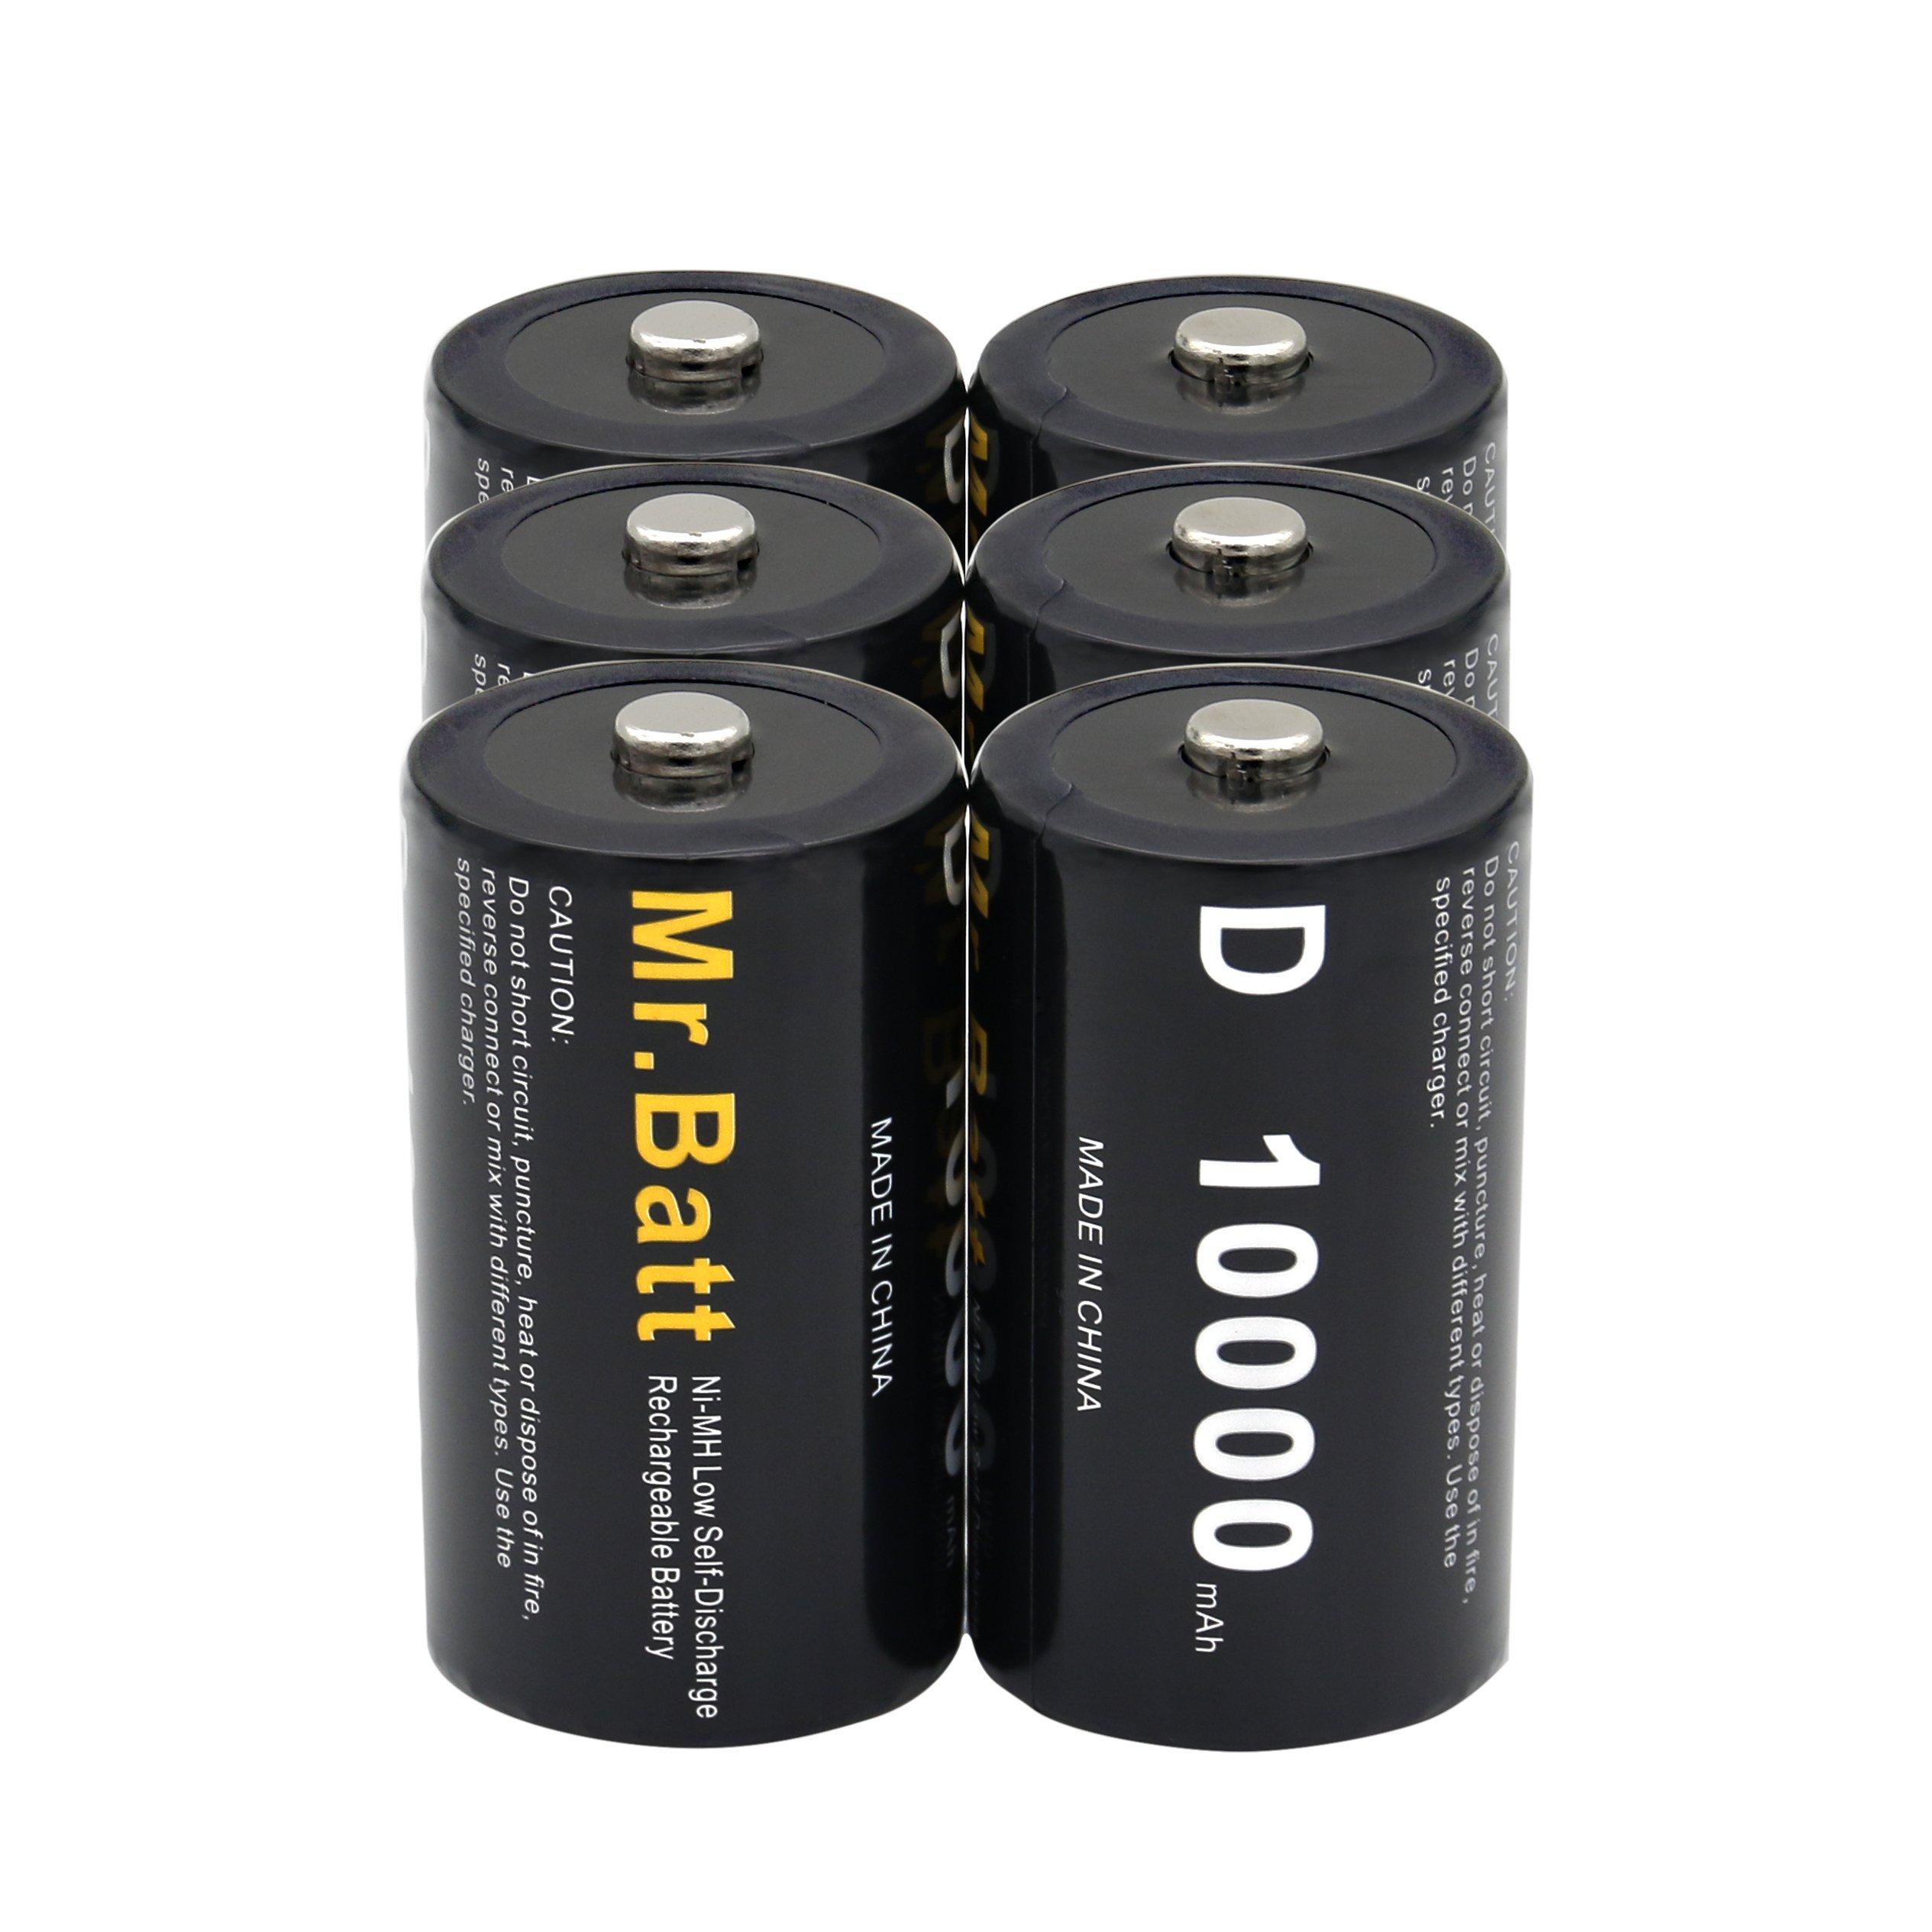 Mr.Batt NiMH Rechargeable D Batteries Low Self Discharge, 10000mAh (6 Pack) by Mr.Batt